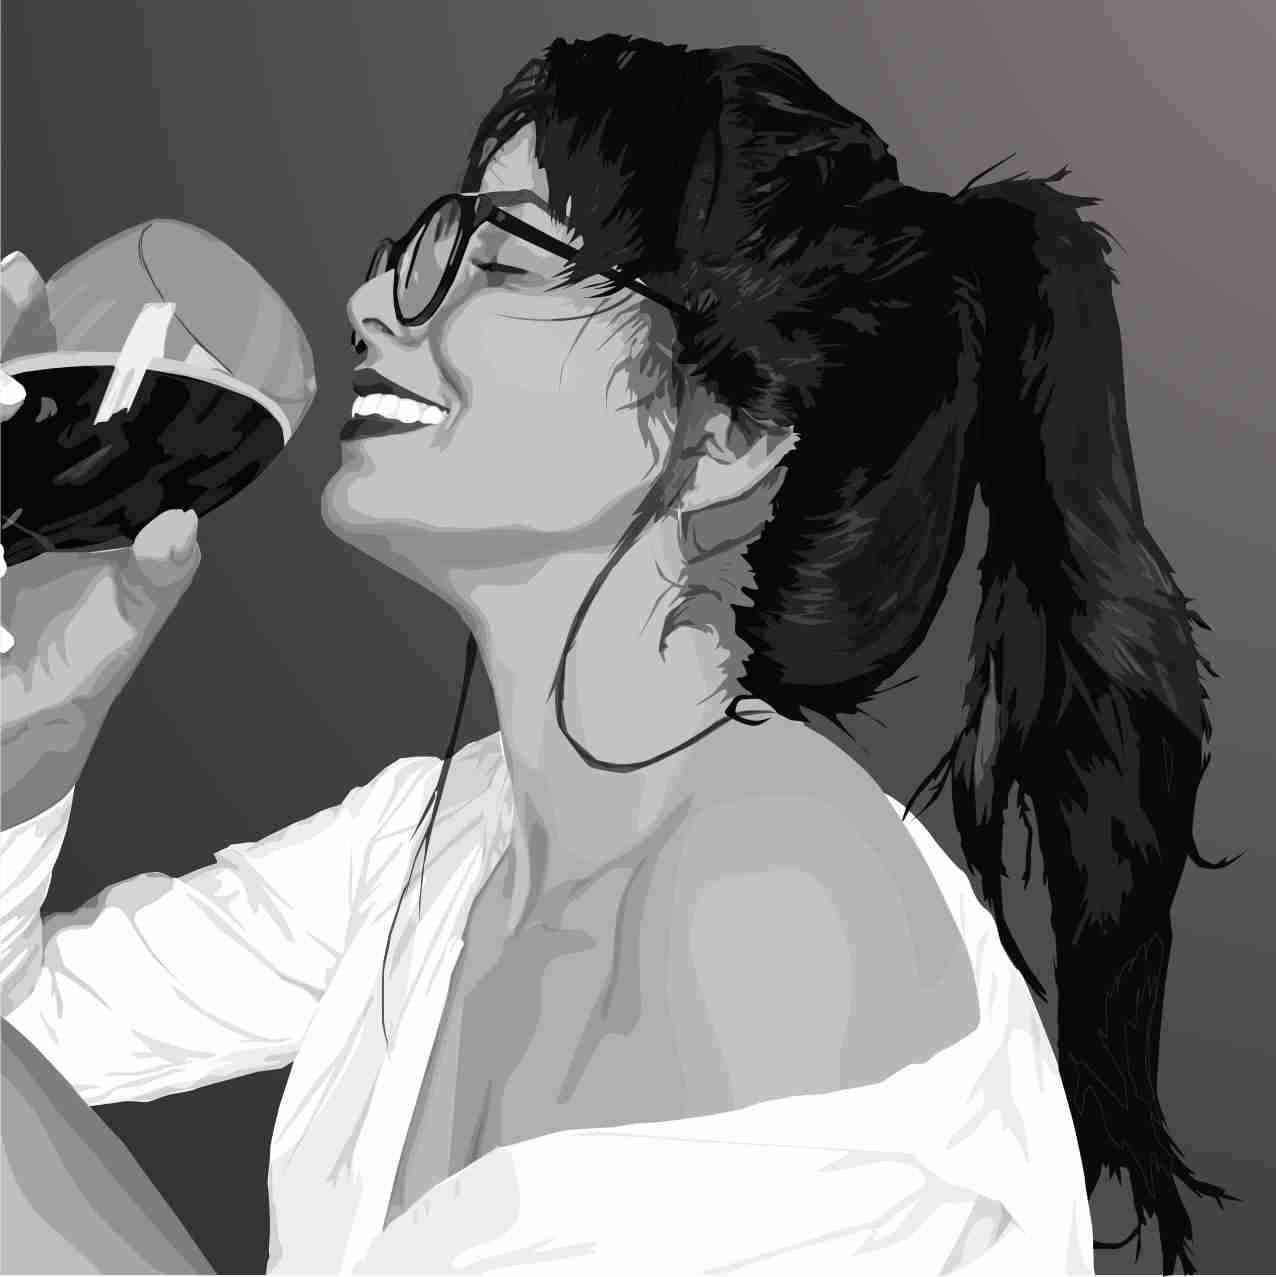 Obra: Sonrisa ilustrada